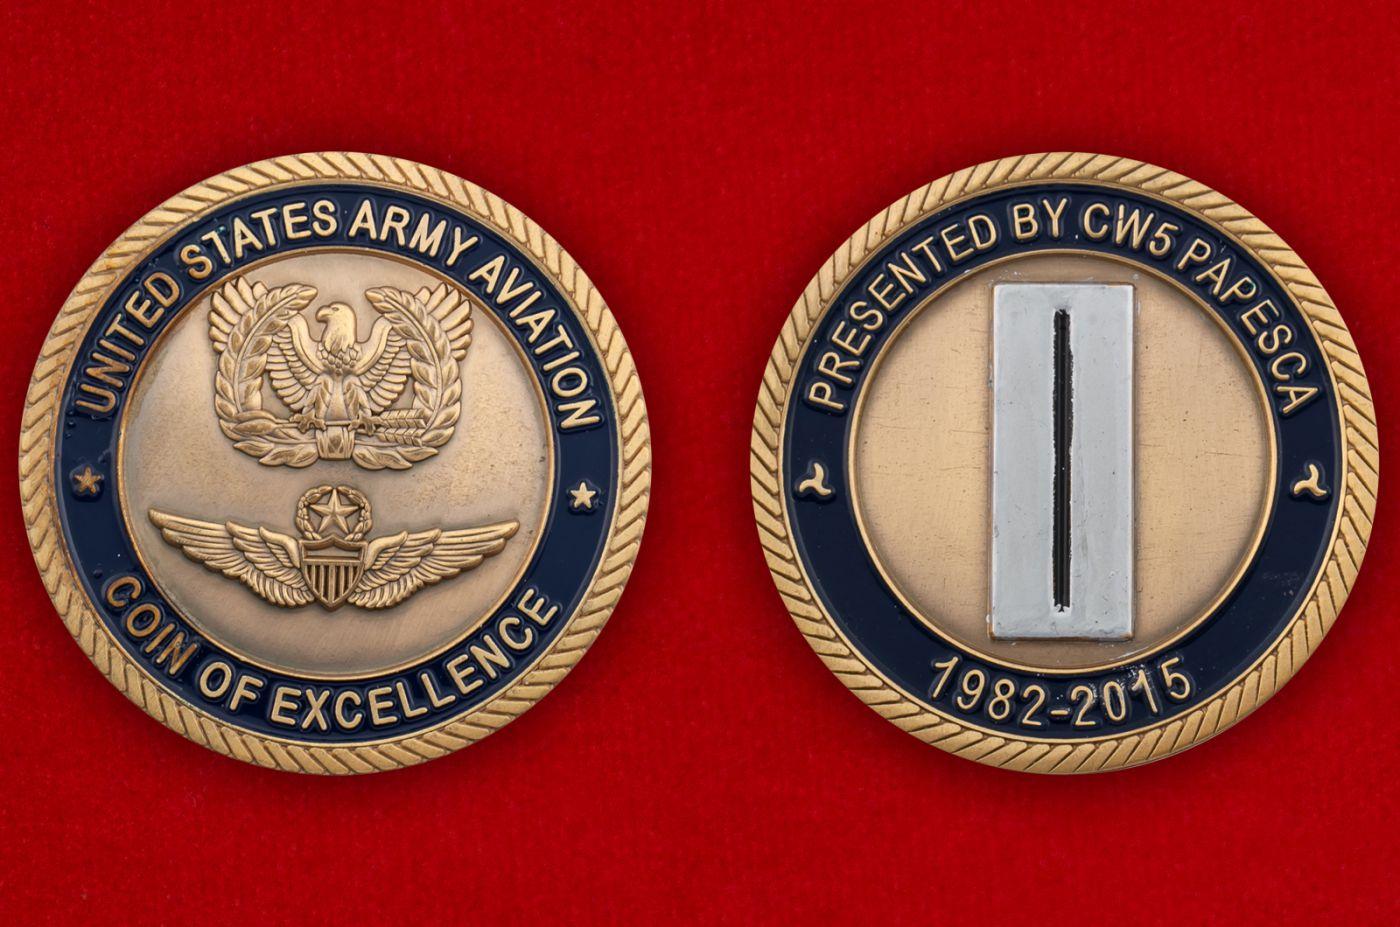 Челлендж коин Армейской авиации США - аверс и реверс